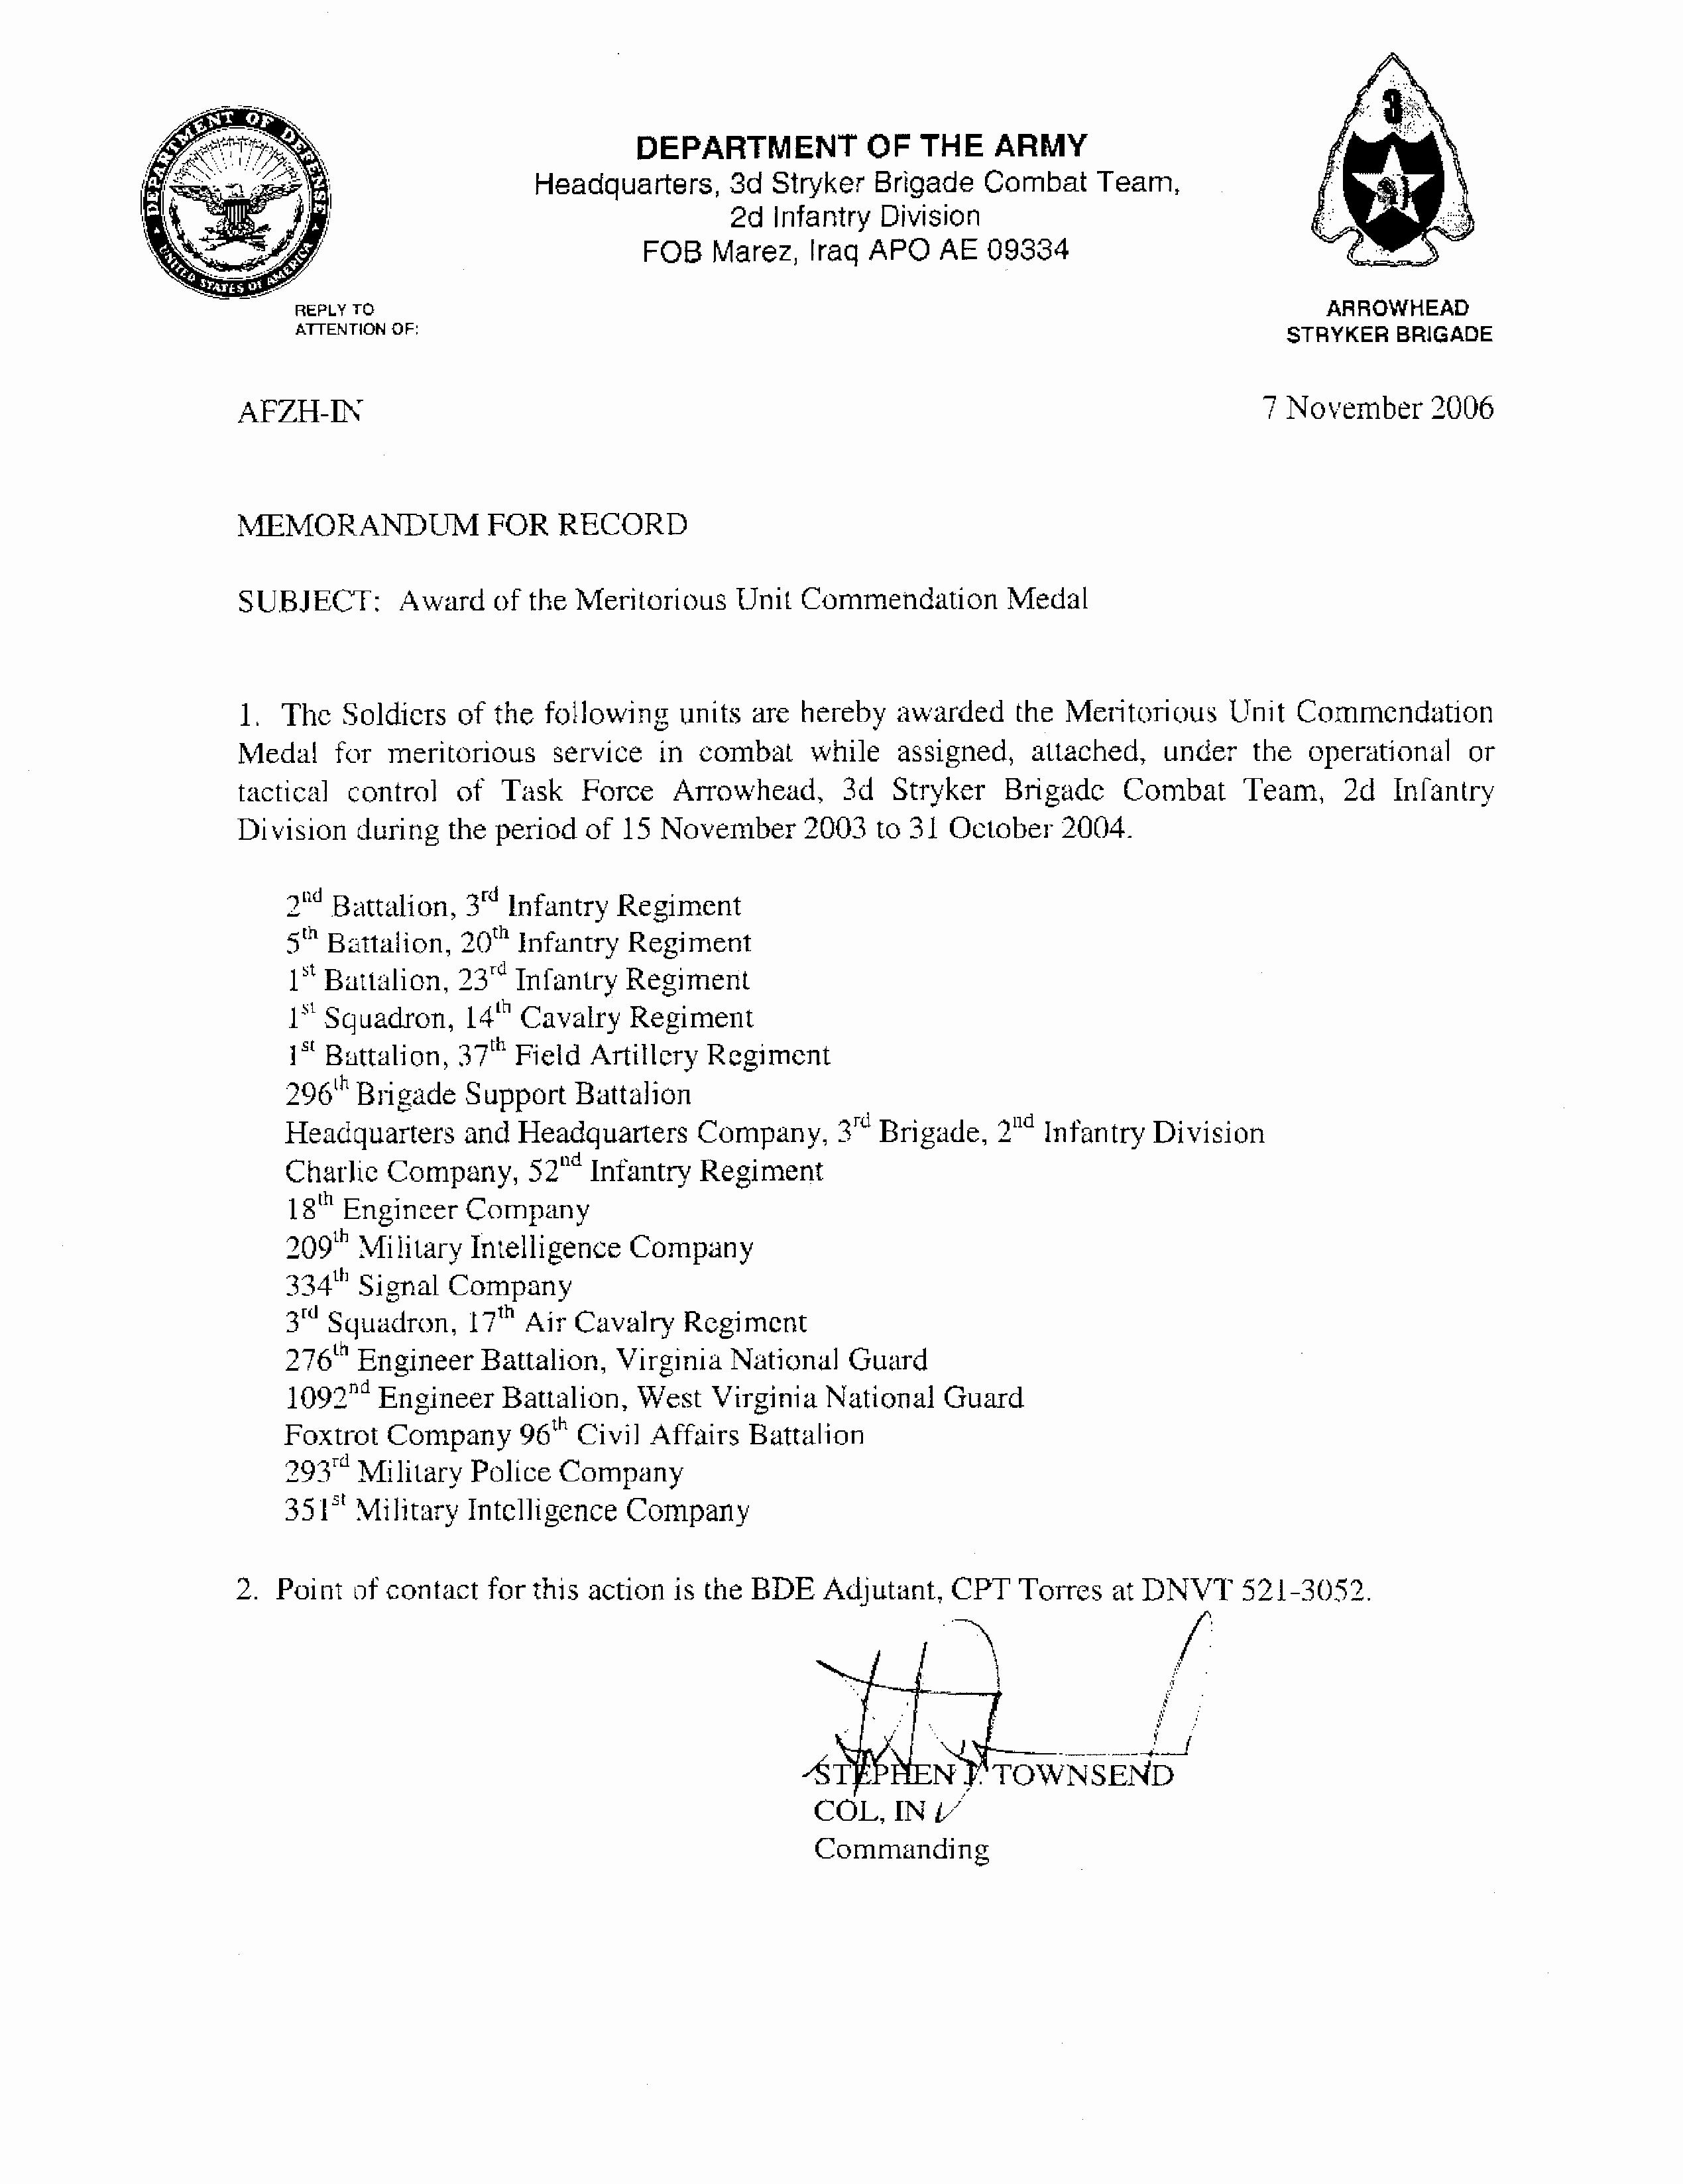 Army Memorandum for Record Template Inspirational 12 Best Of Ar 25 50 Memorandum Example Ar 25 50